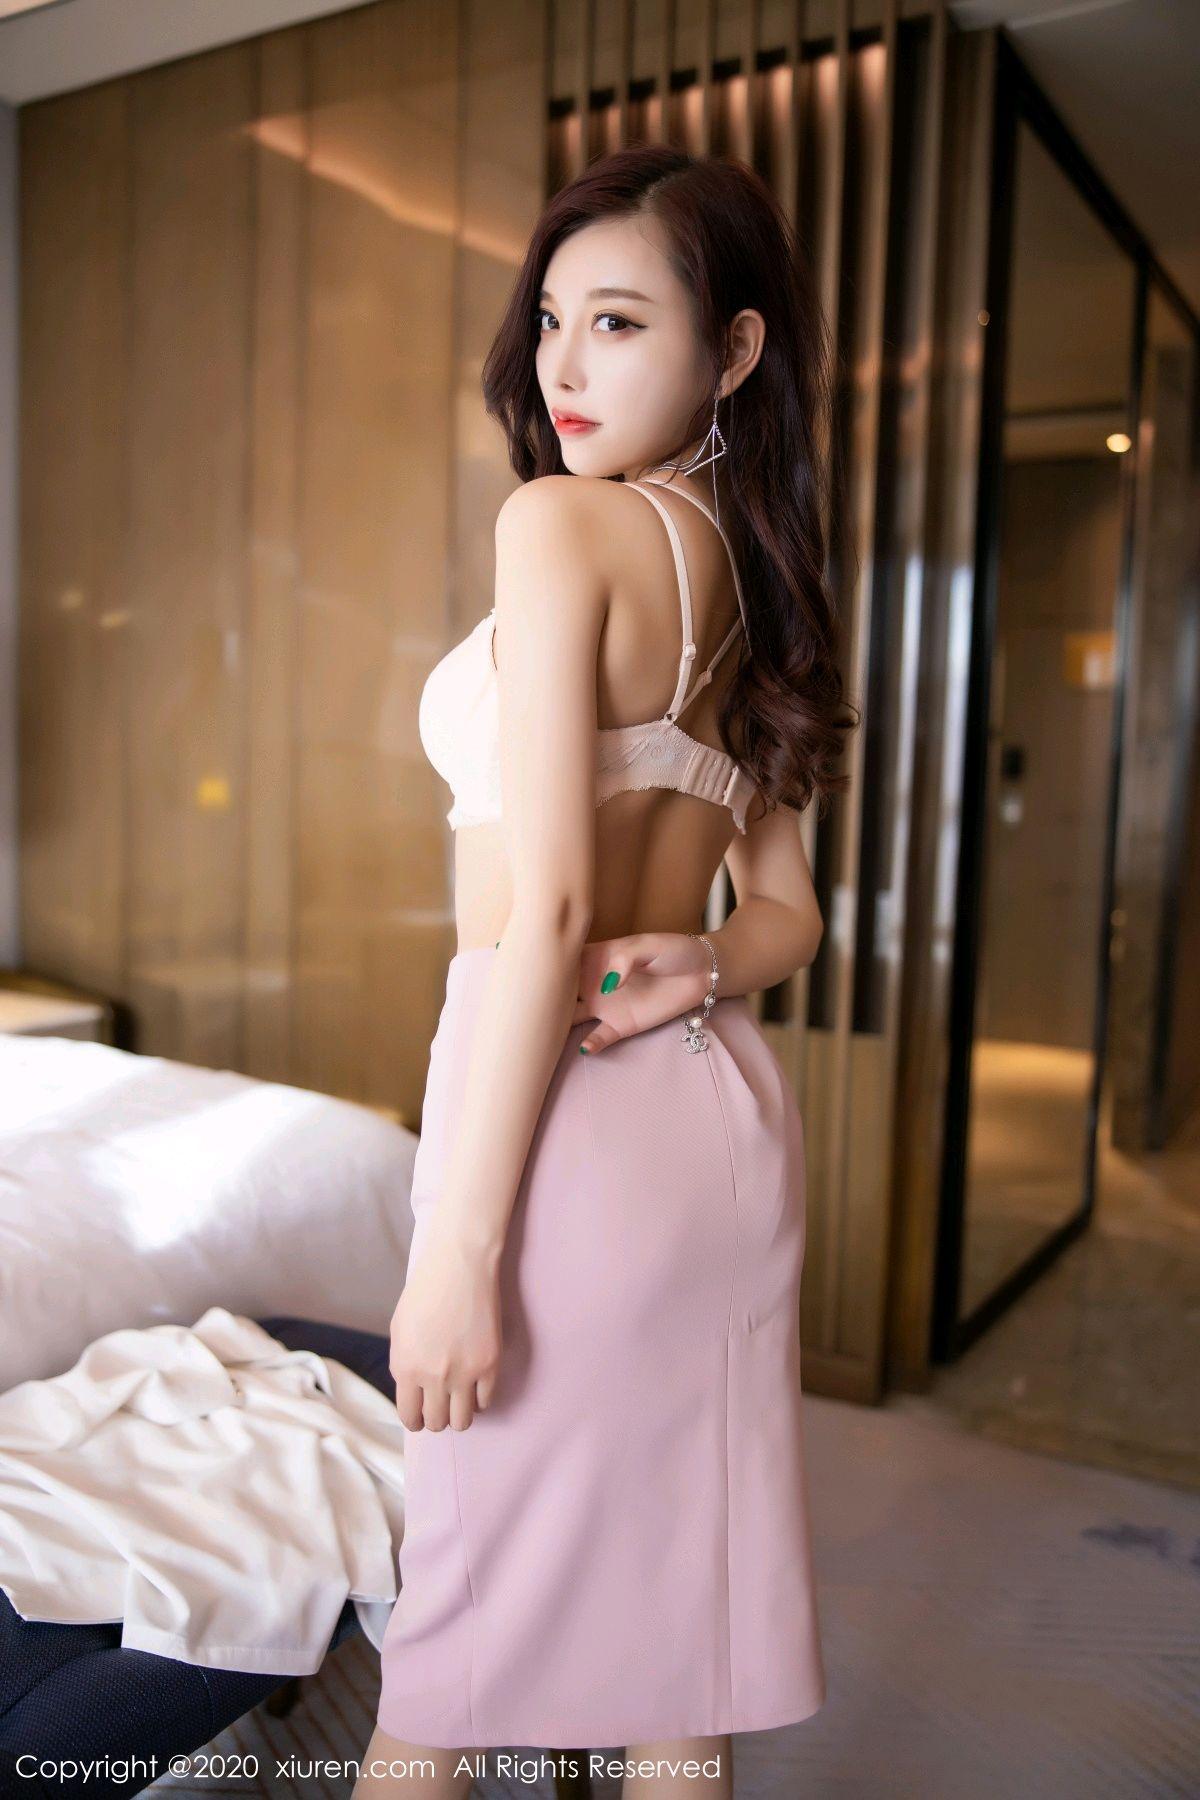 [XiuRen] Vol.2431 Yang Chen Chen 60P, Tall, Underwear, Uniform, Xiuren, Yang Chen Chen